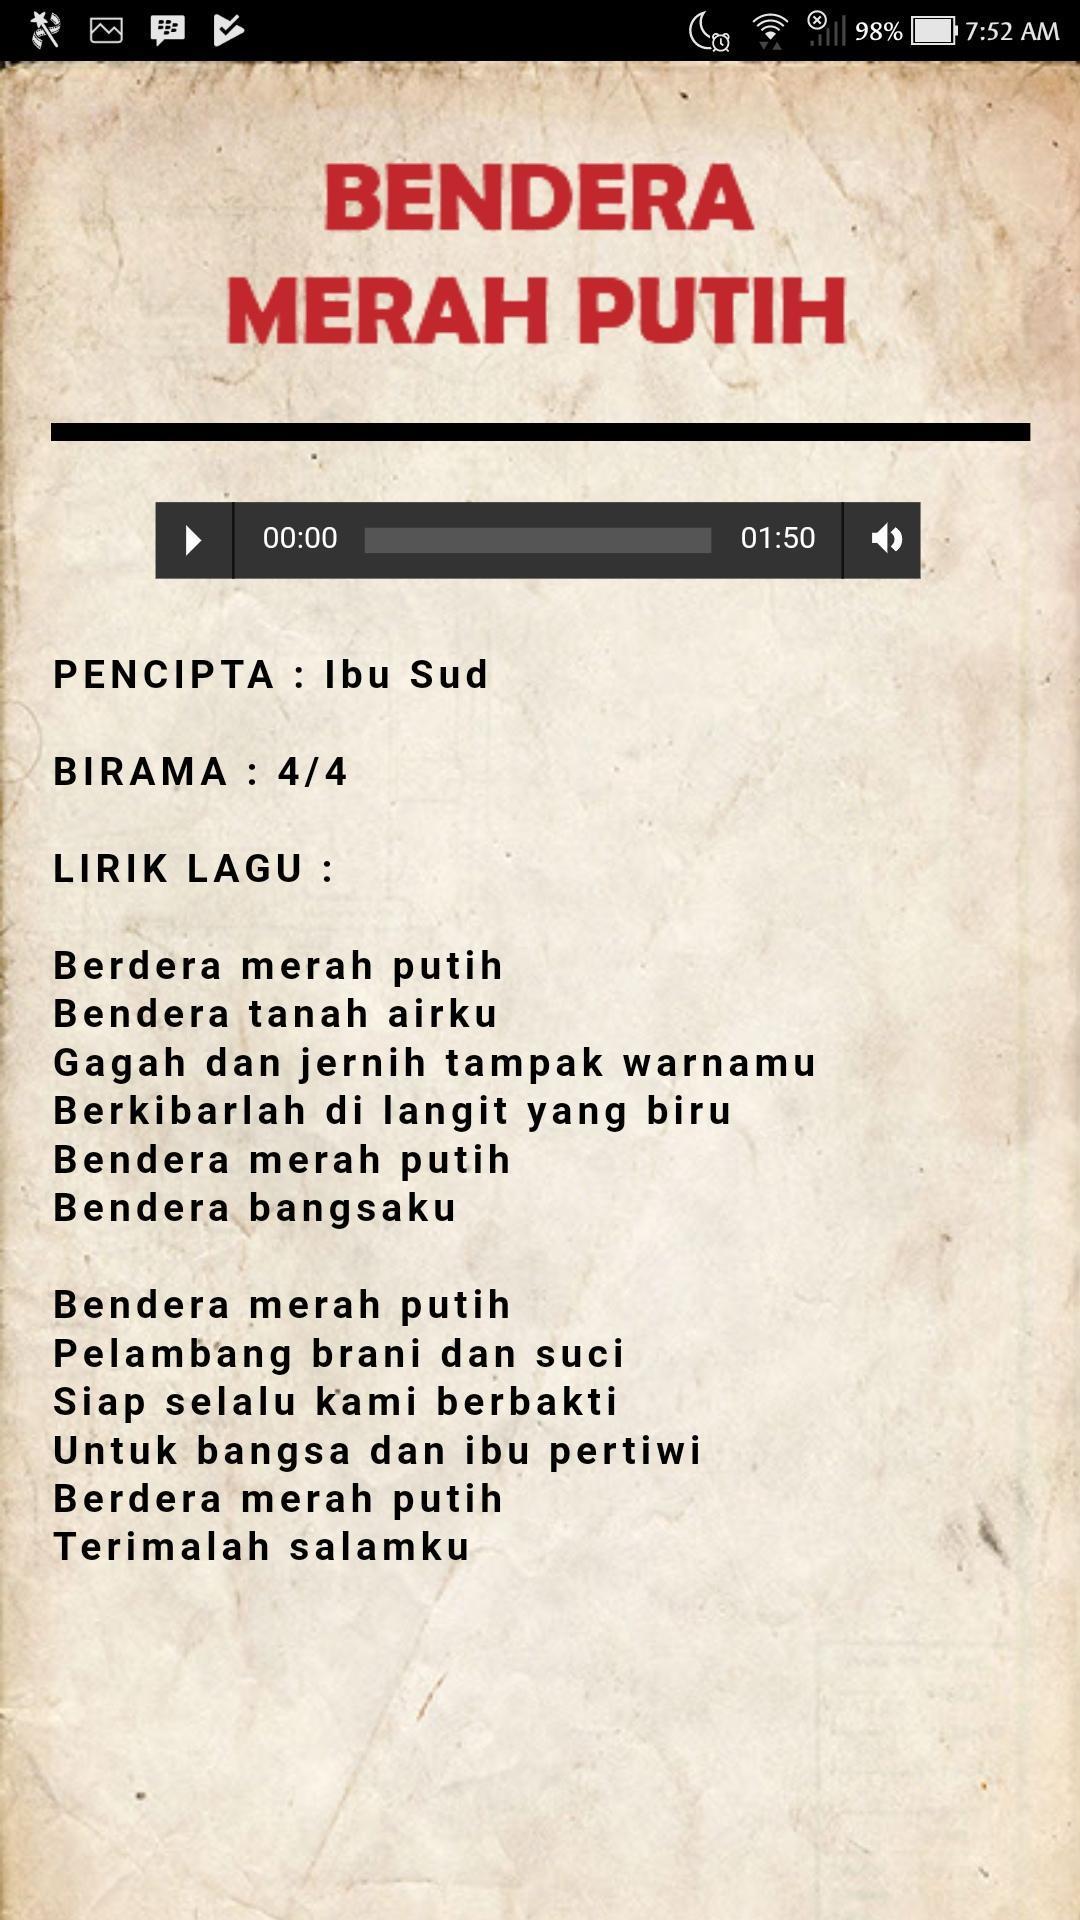 Lagu Wajib Nasional Indonesia (17 Lagu) for Android - APK